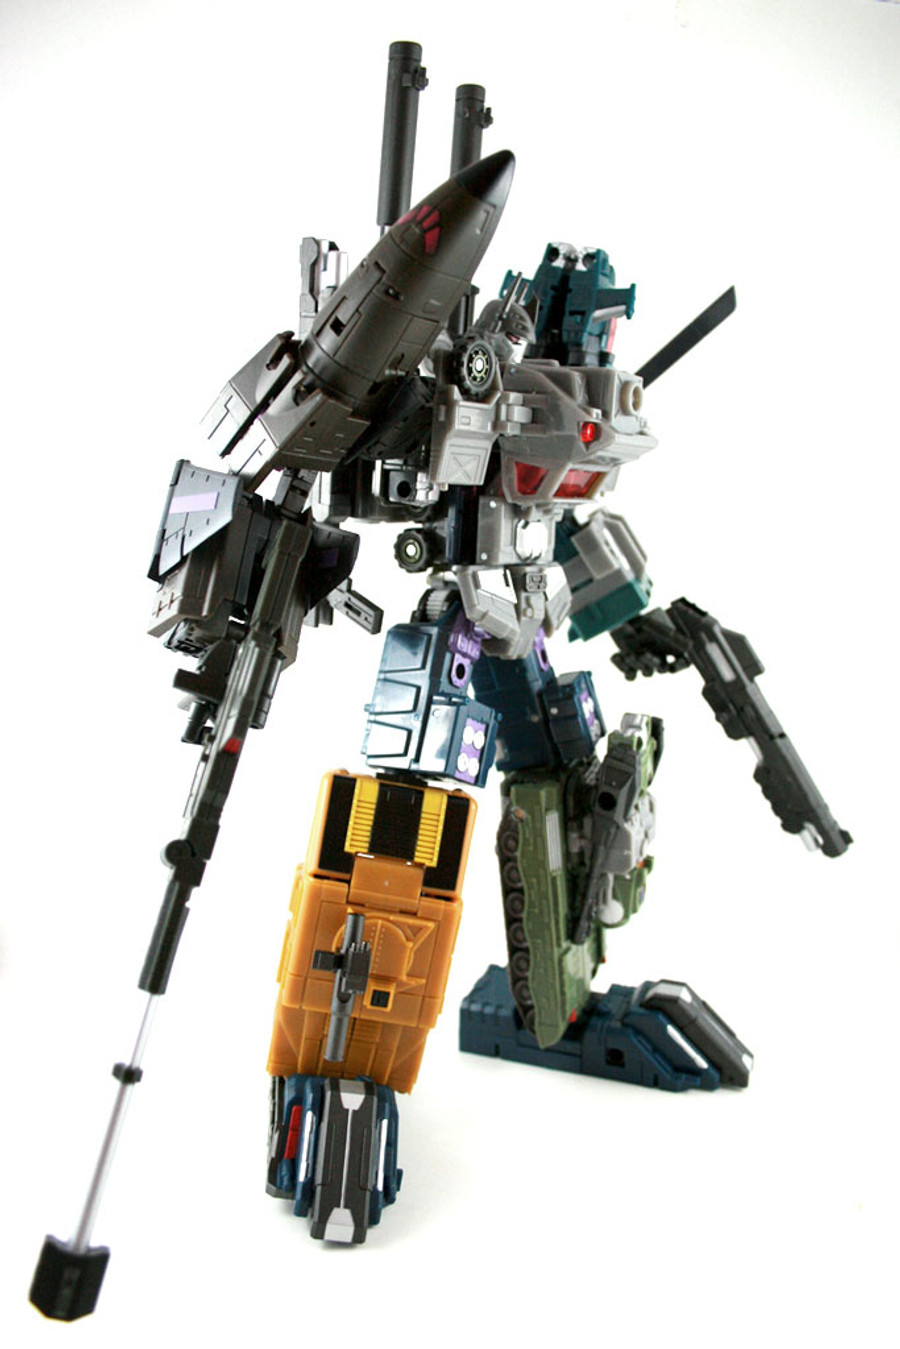 FansProject - Crossfire 02 - Explorer & Munitioner - G1 Colors